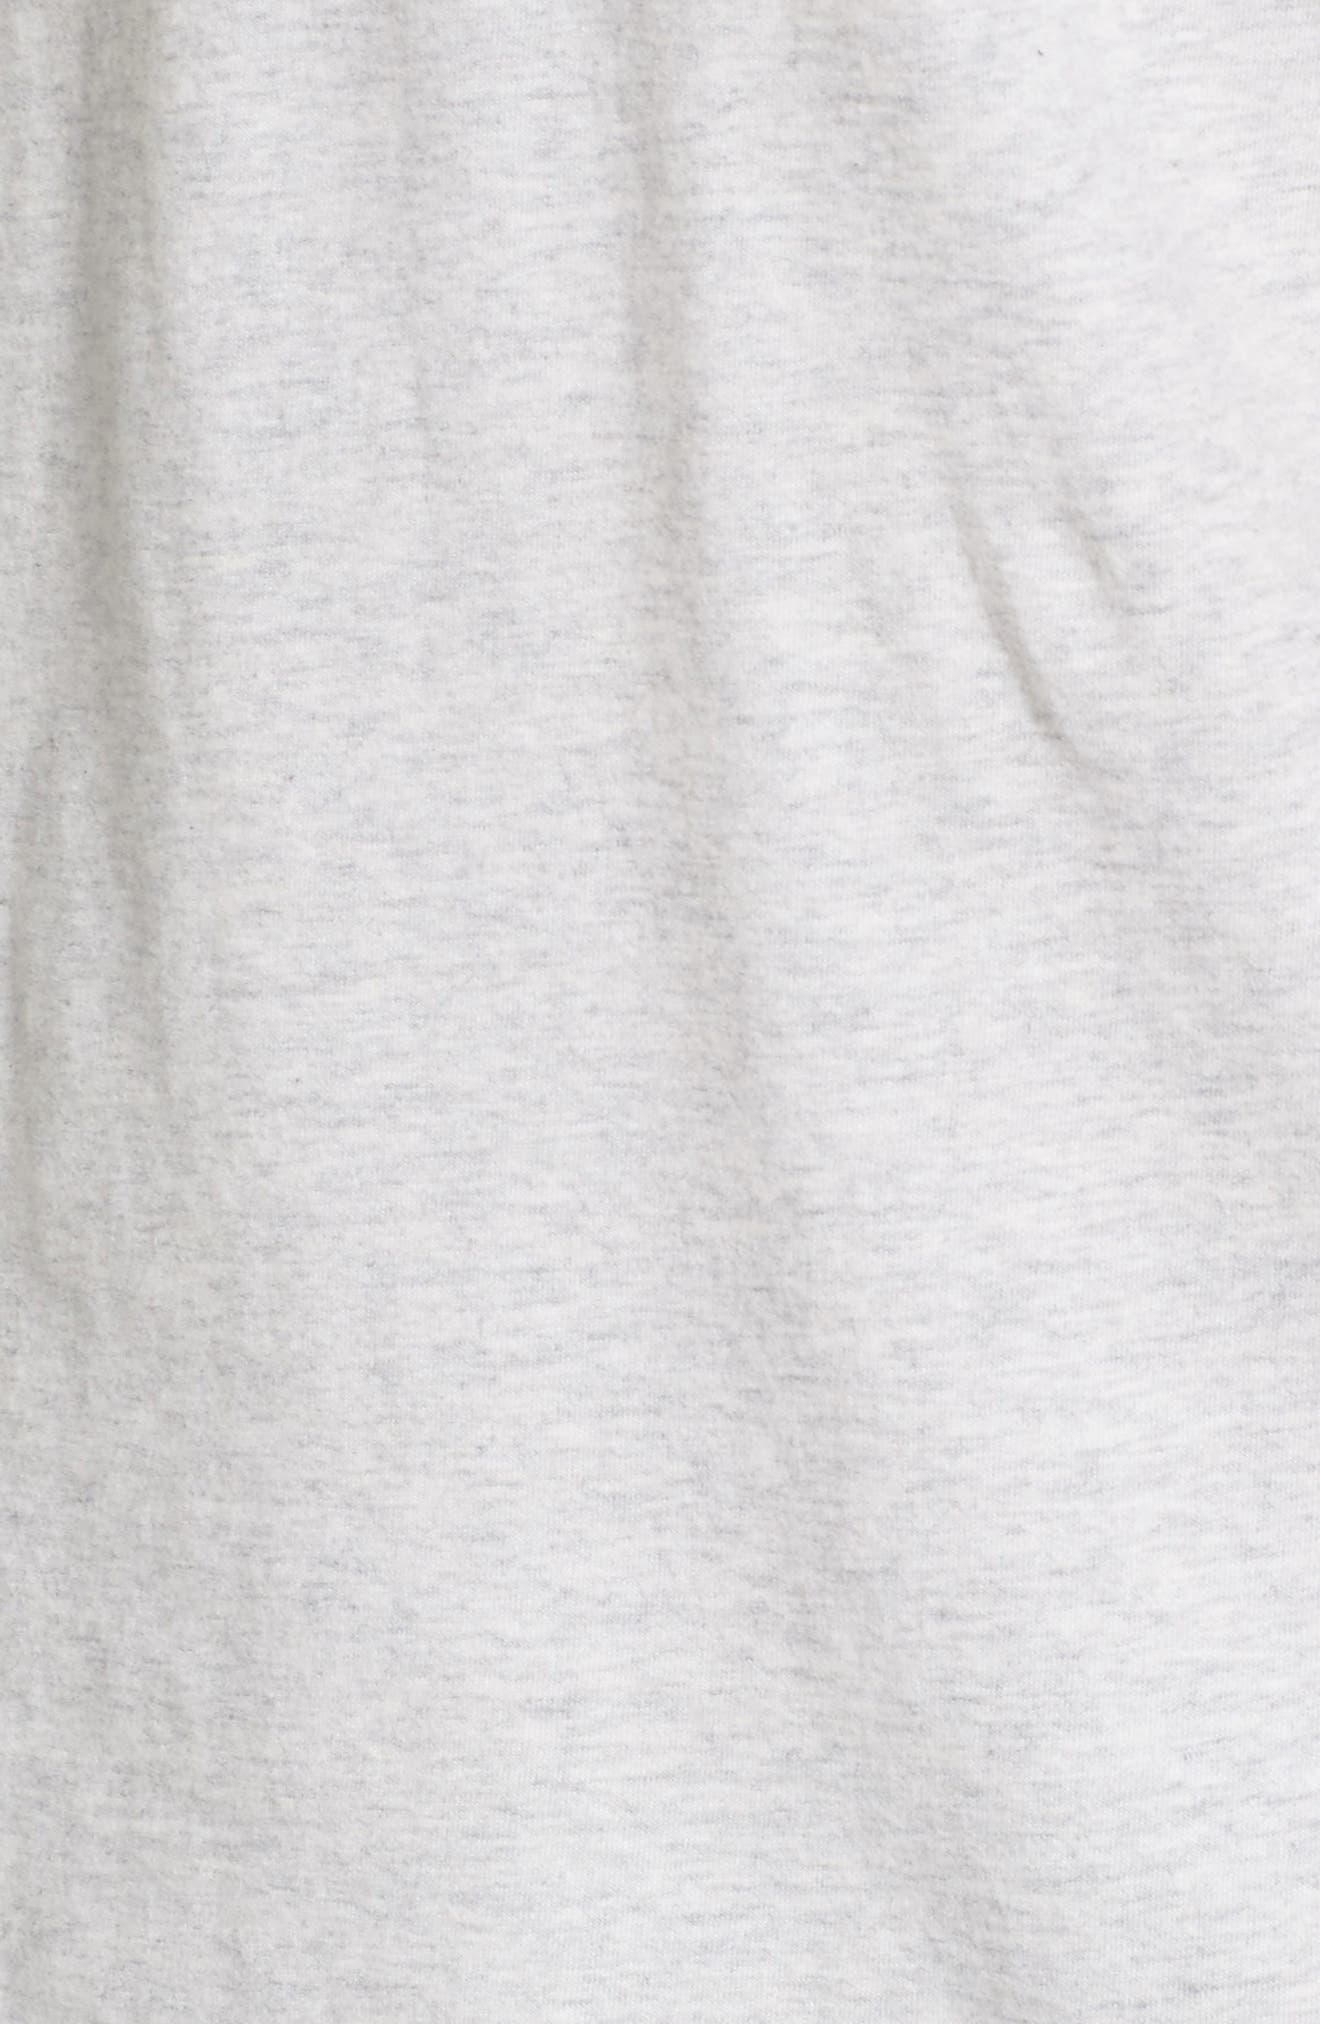 Cove Slim Fit Logo Graphic T-Shirt,                             Alternate thumbnail 5, color,                             260